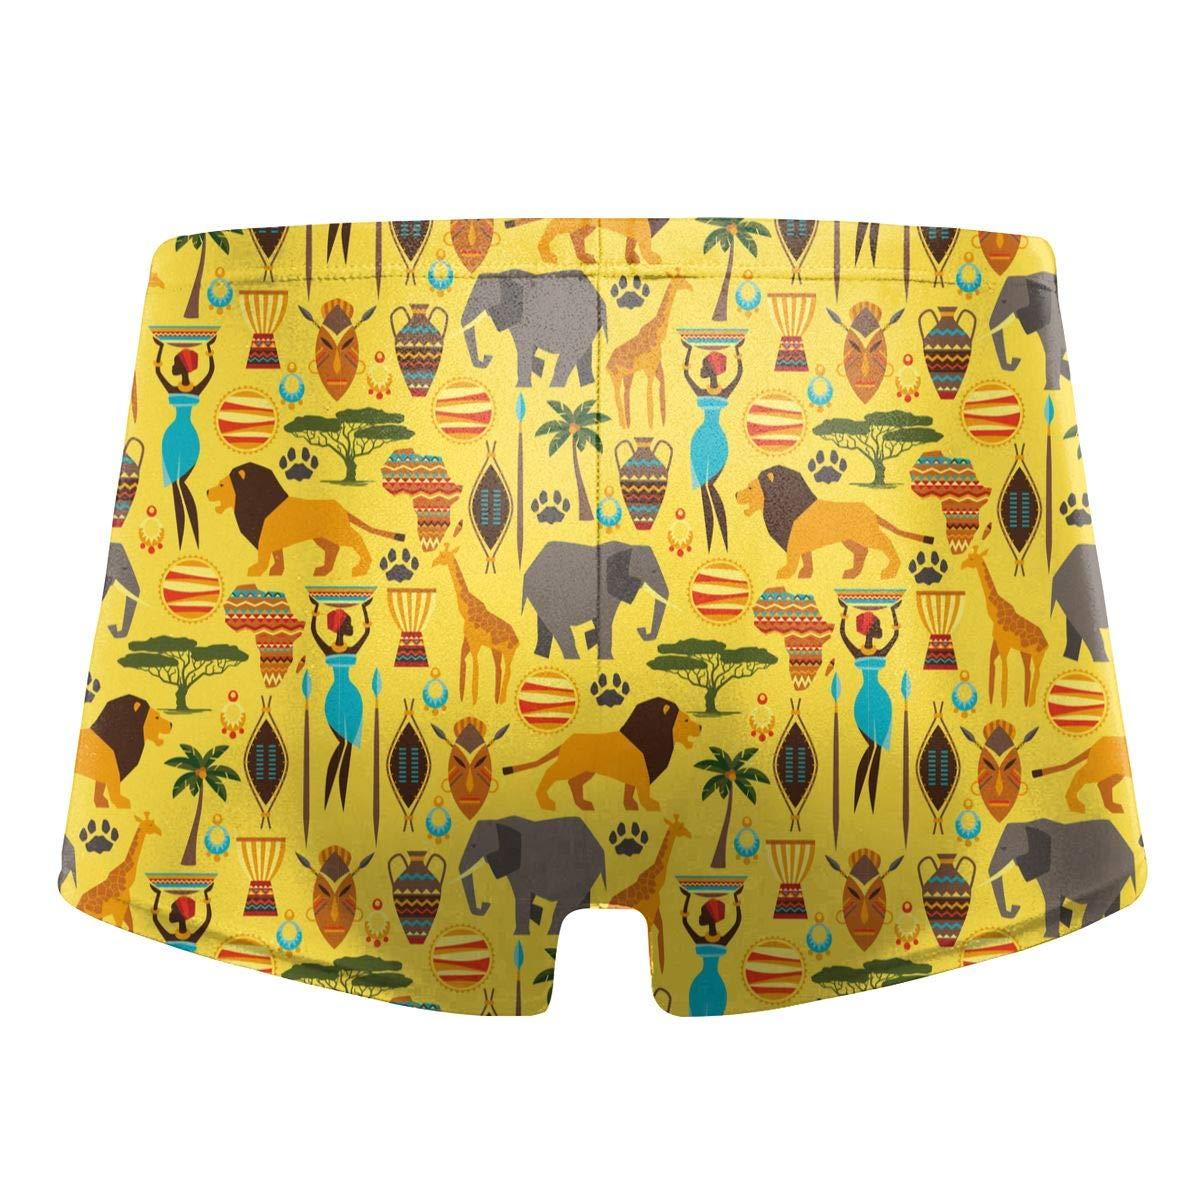 G66TCX Mens Swim Trunks Animal Print Quick Dry Board Shorts Boxer Brief Swimsuit Swim Underwear